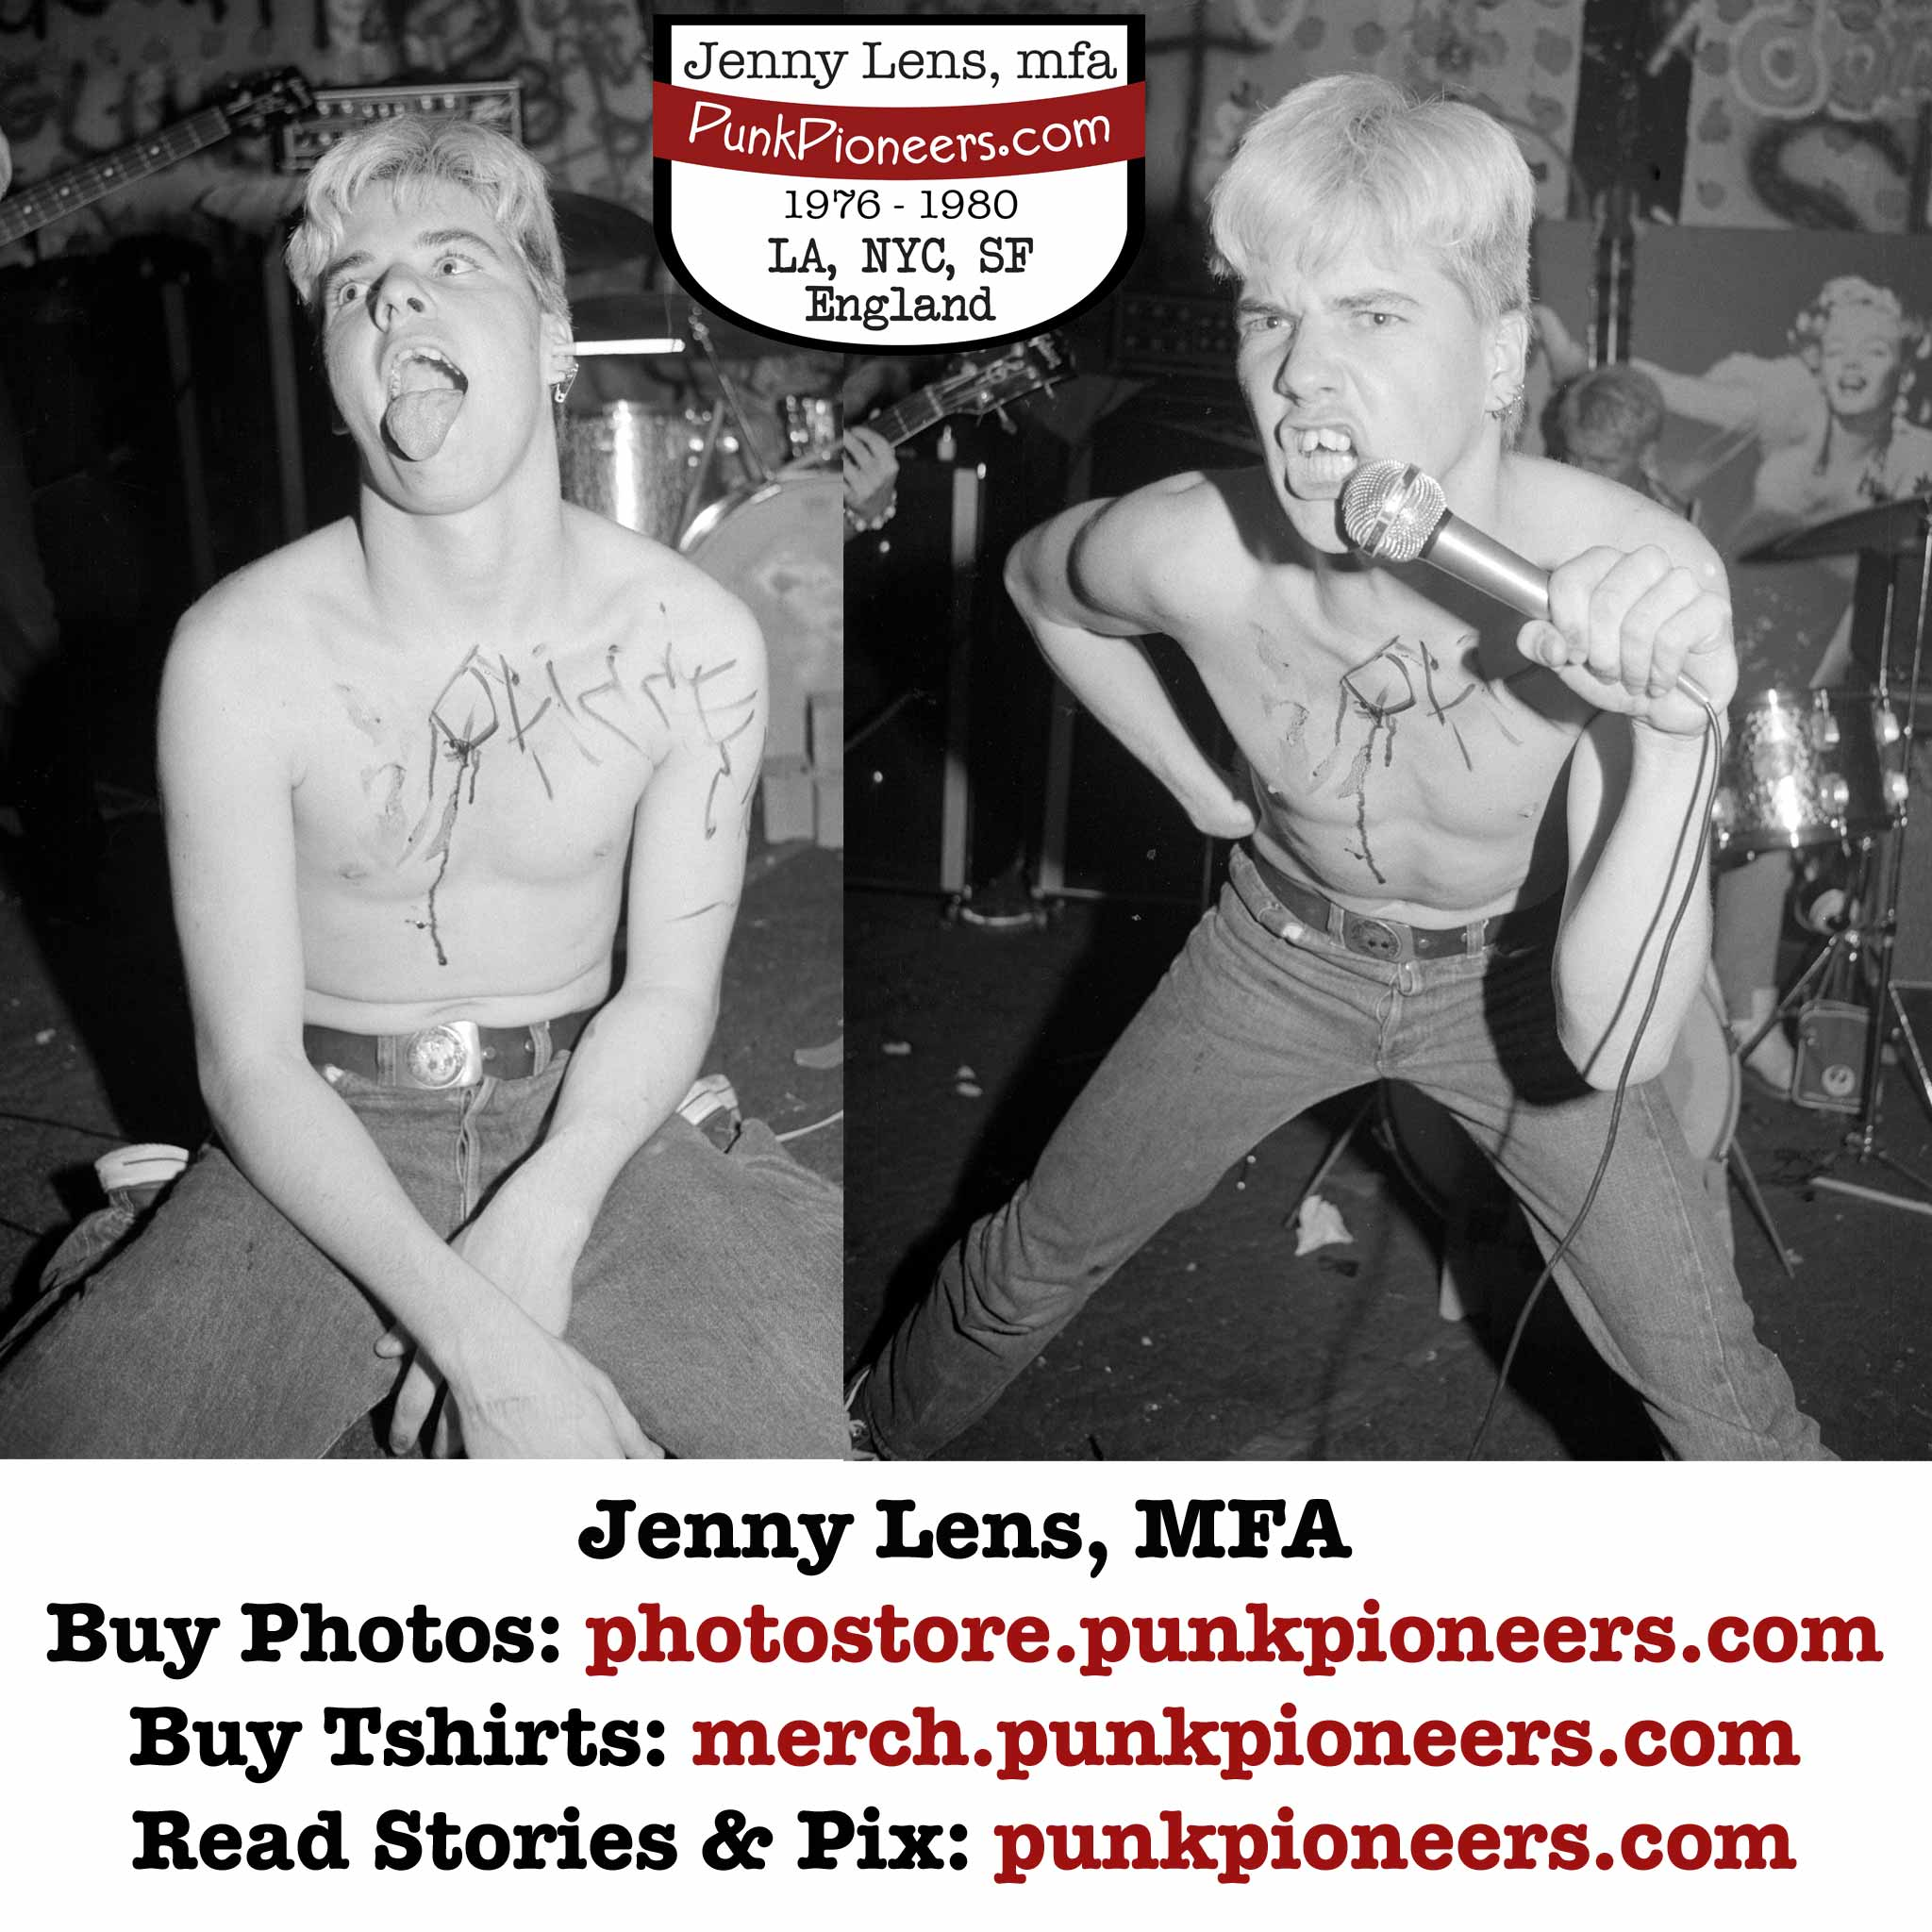 Germs Short Vid with Jenny Lens Punk Photos